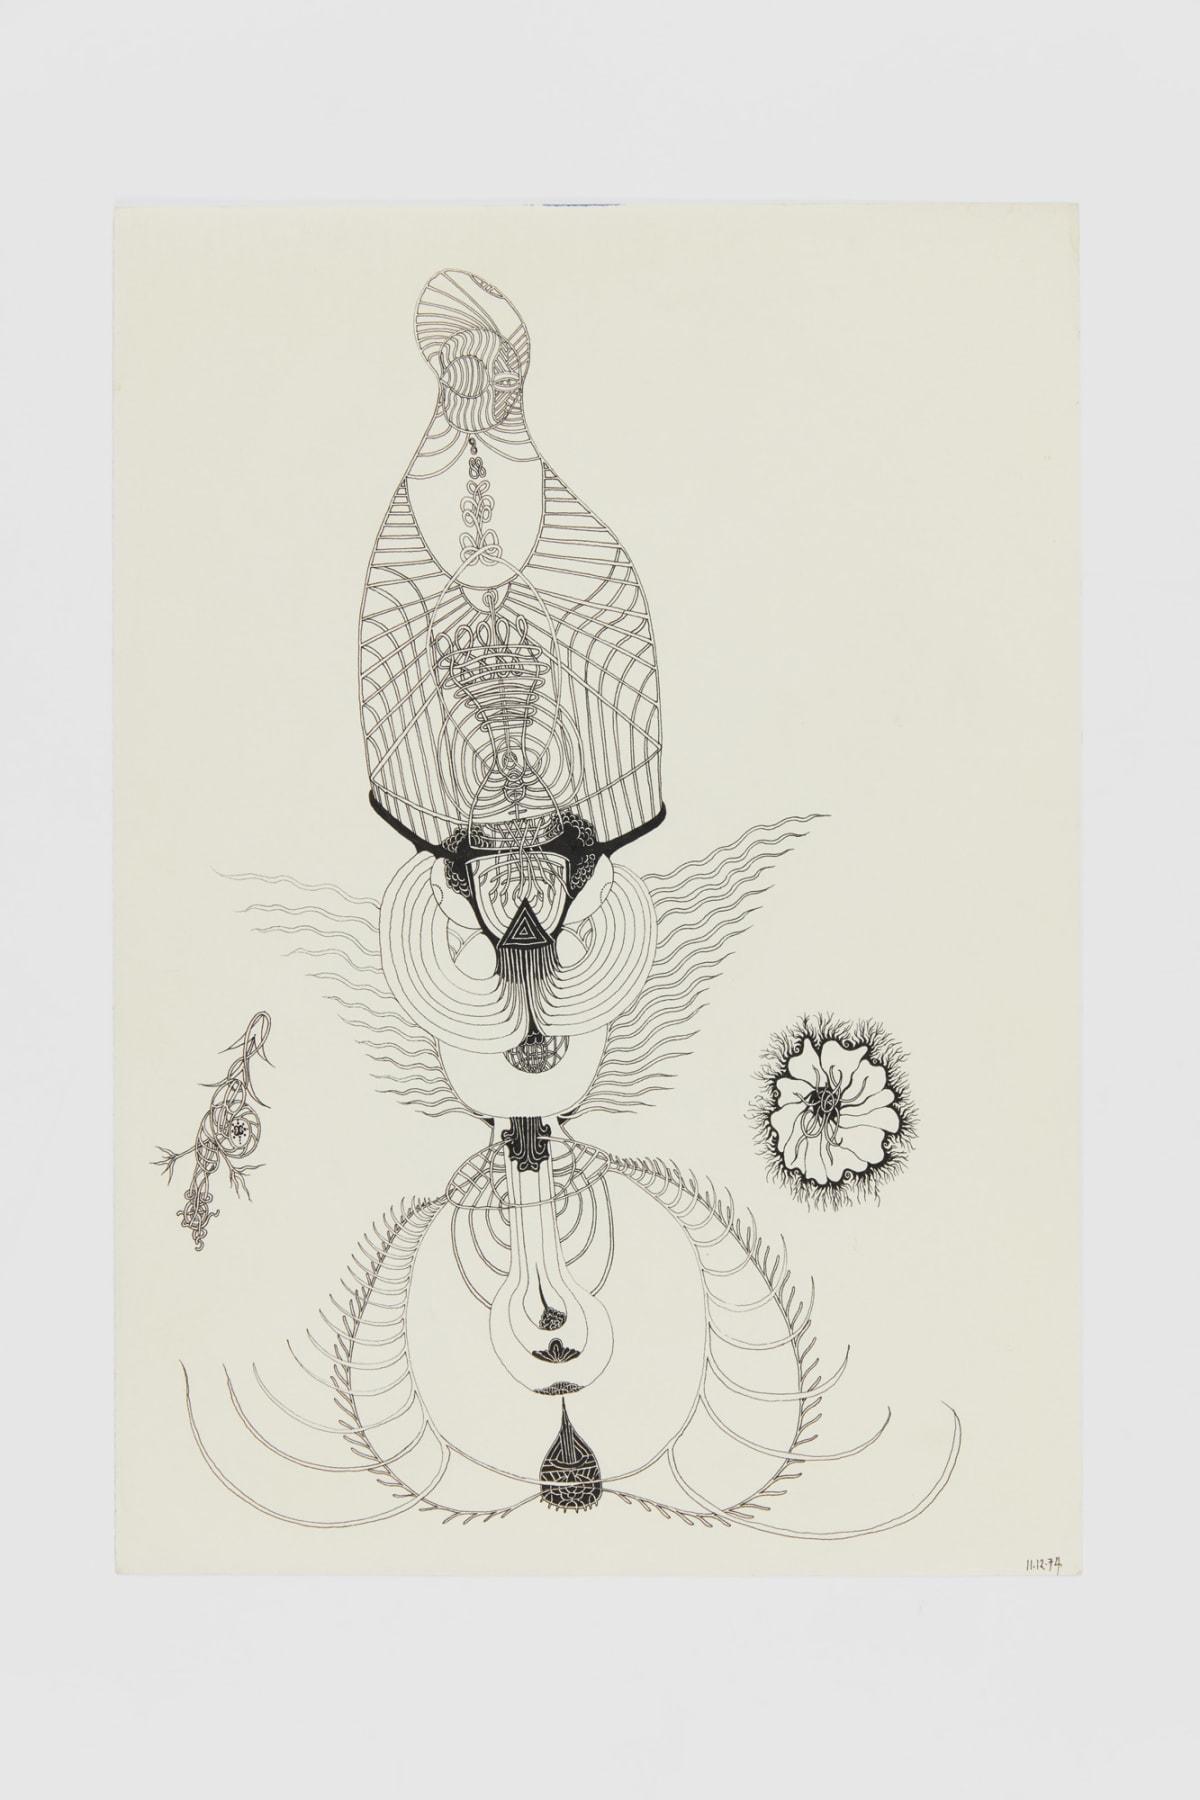 Ann CHURCHILL 11.12.74 (Daily drawing), 1974 Pen on paper 29.7 x 20.9 cm